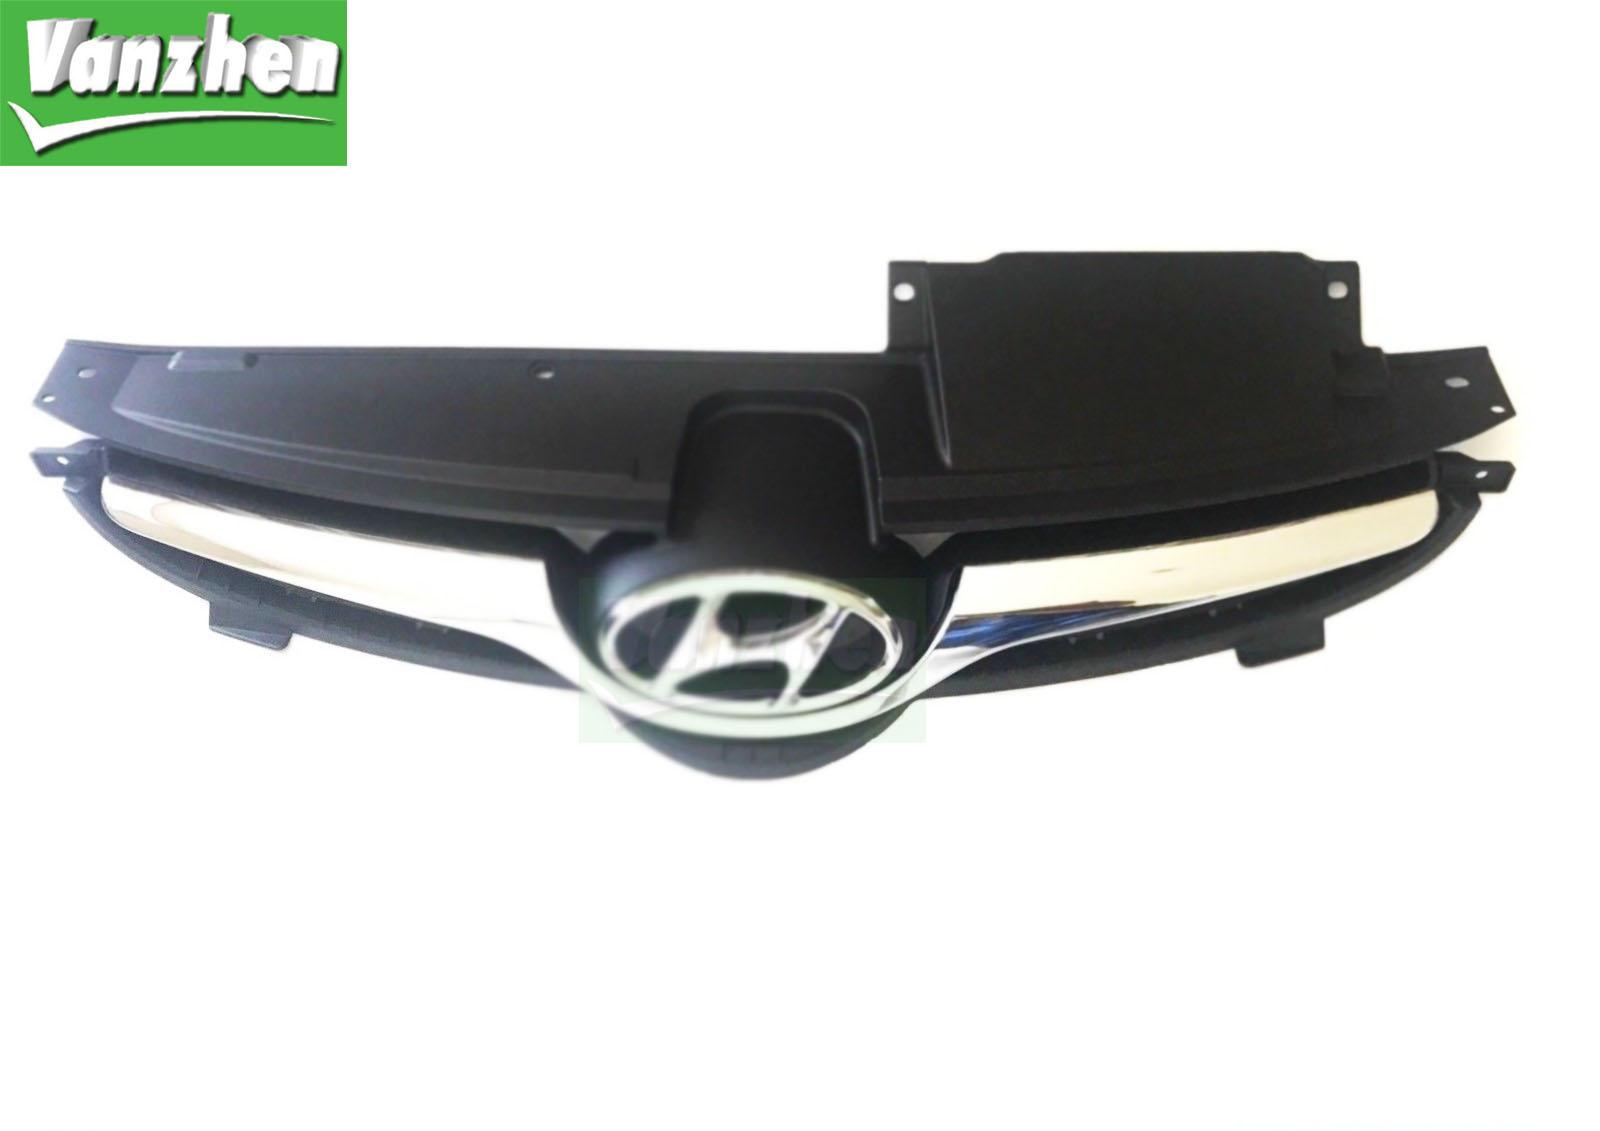 2019 Grille Front Bumper Fit For Car Hyundai Elantra Sedan 2014 2015